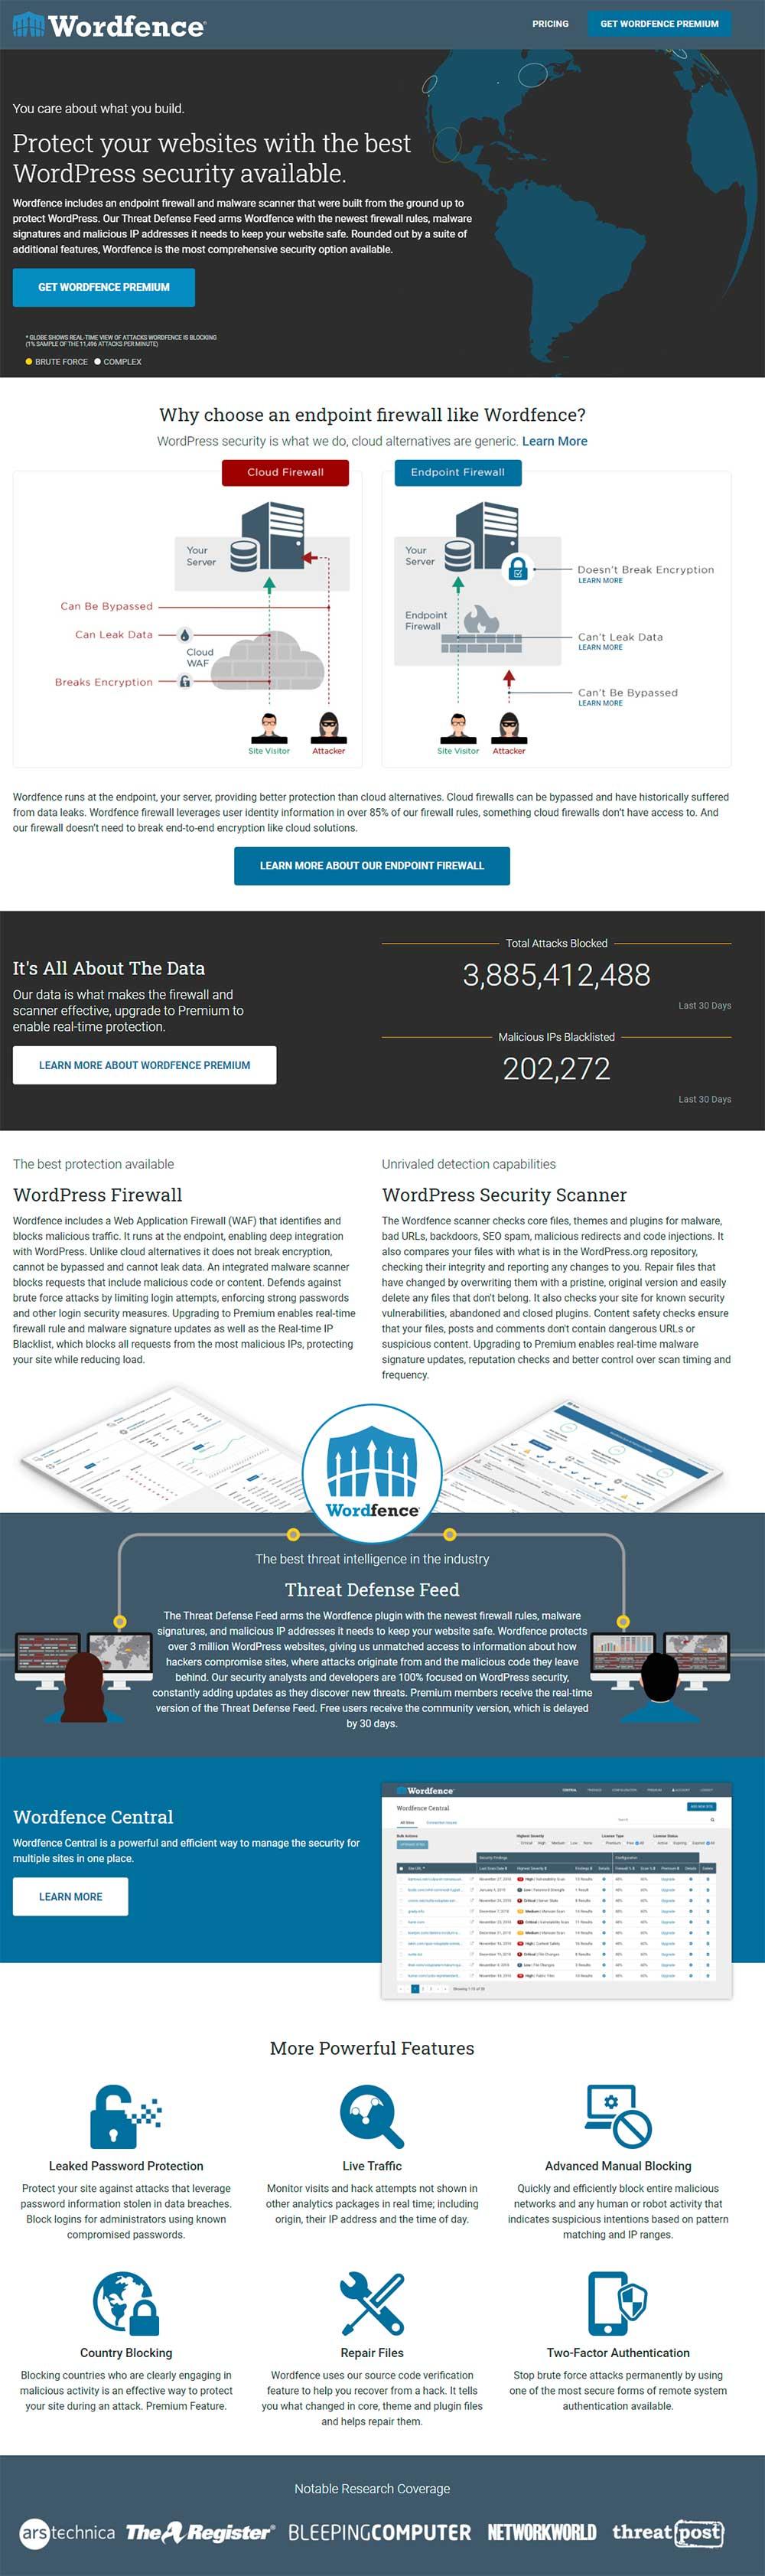 Wordfence - WordPress Security Firewall Plugin